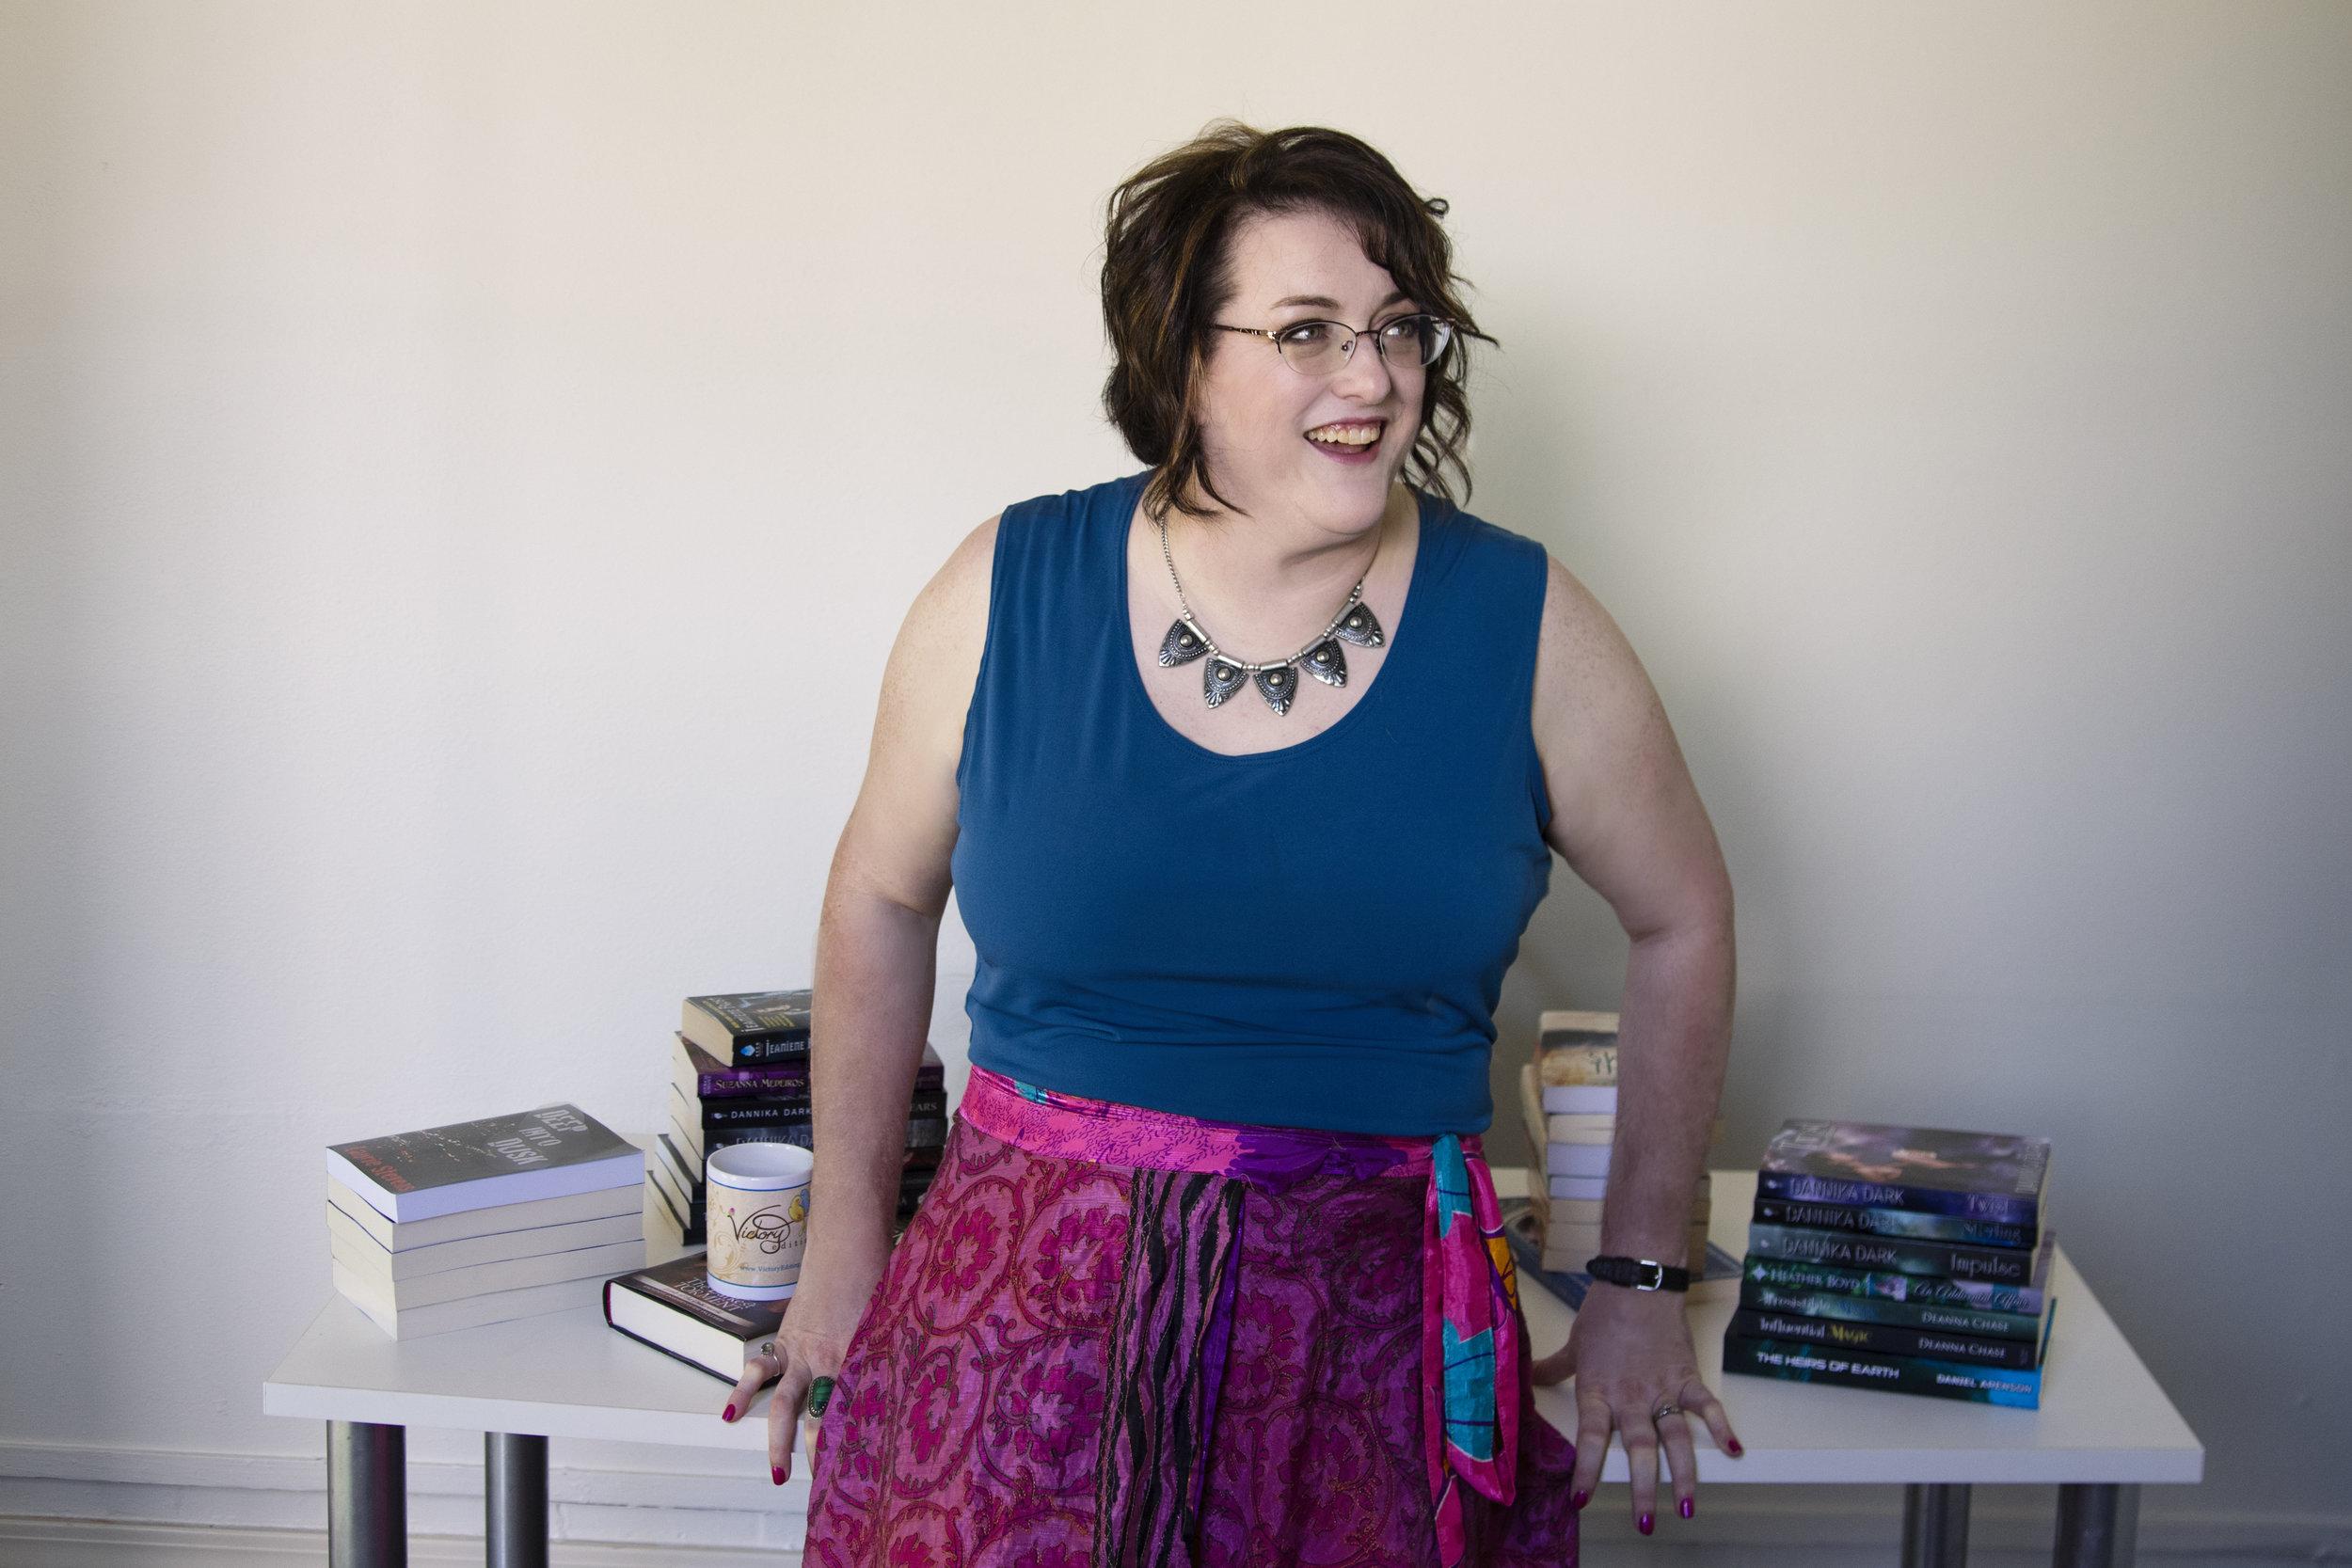 Branding Portraits of an Editor